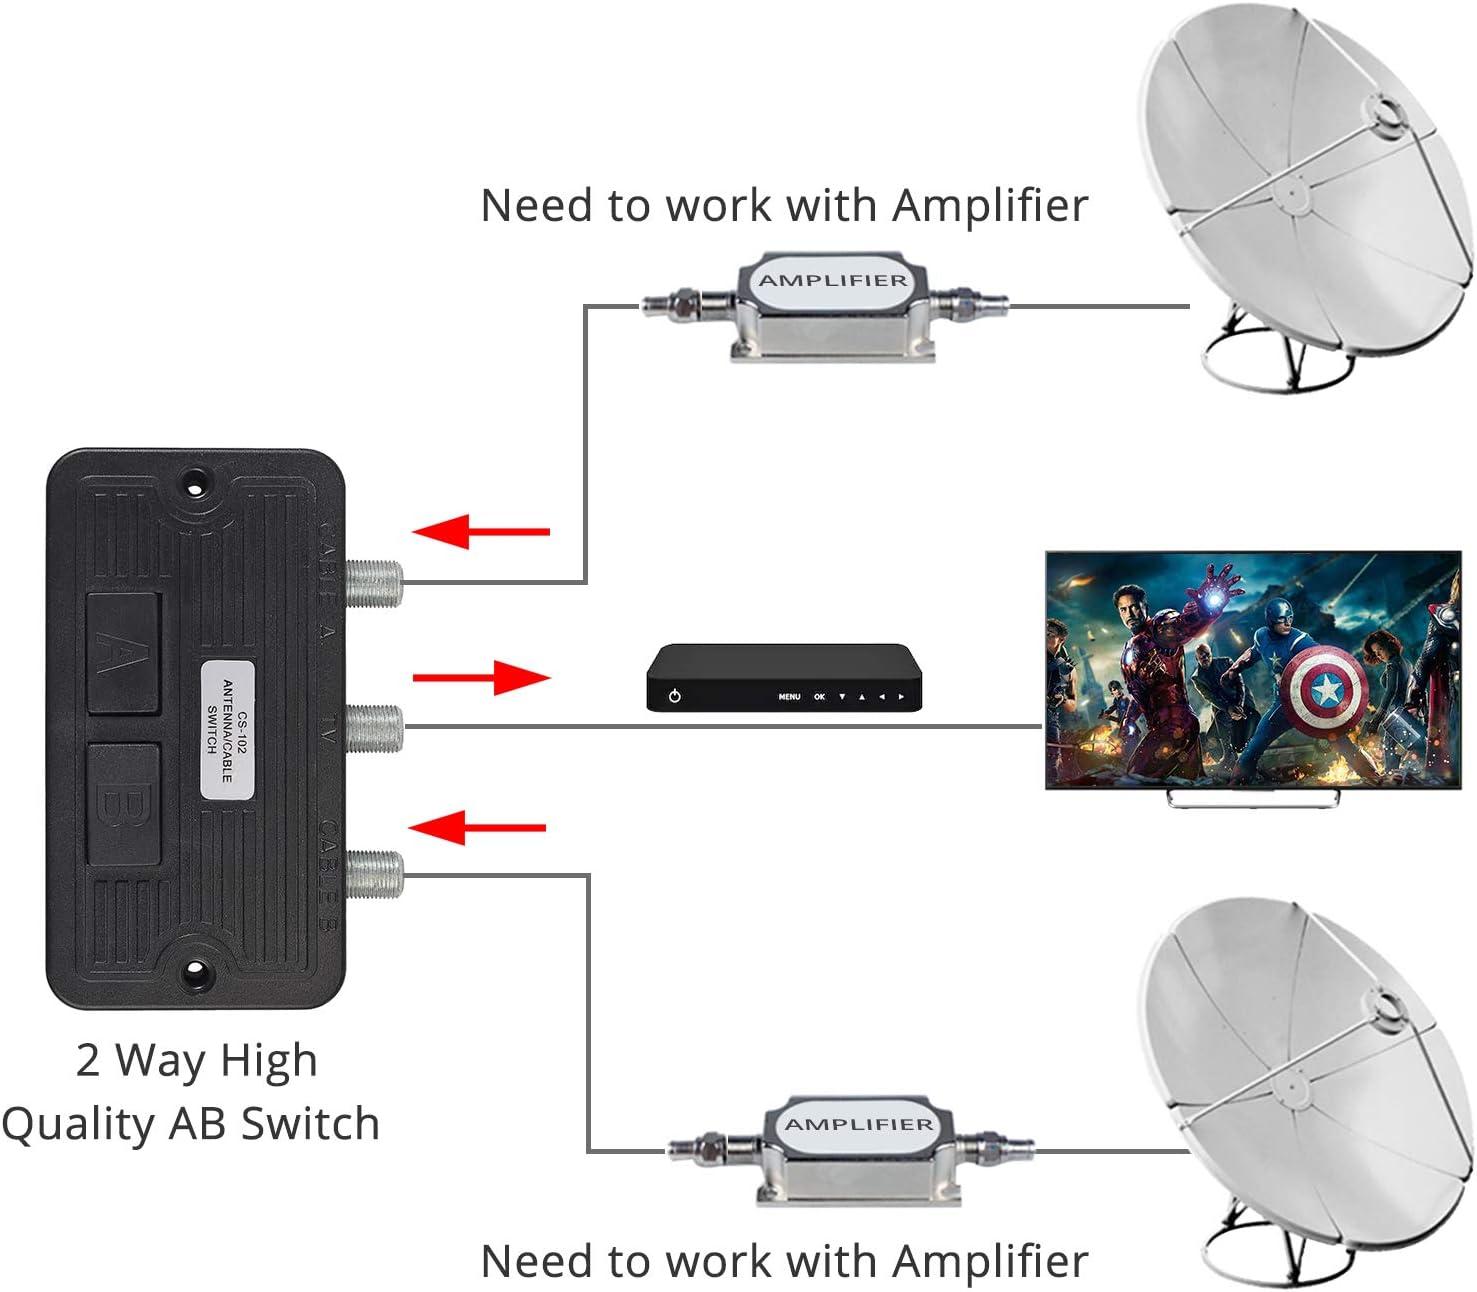 Justech 1 x 2 Vías Divisor de Cable Coaxial Splitter de TV de Banda Ancha Interruptor AB de 2 Entradas y 1 Salida con 1m Cable con Enchufe F ...